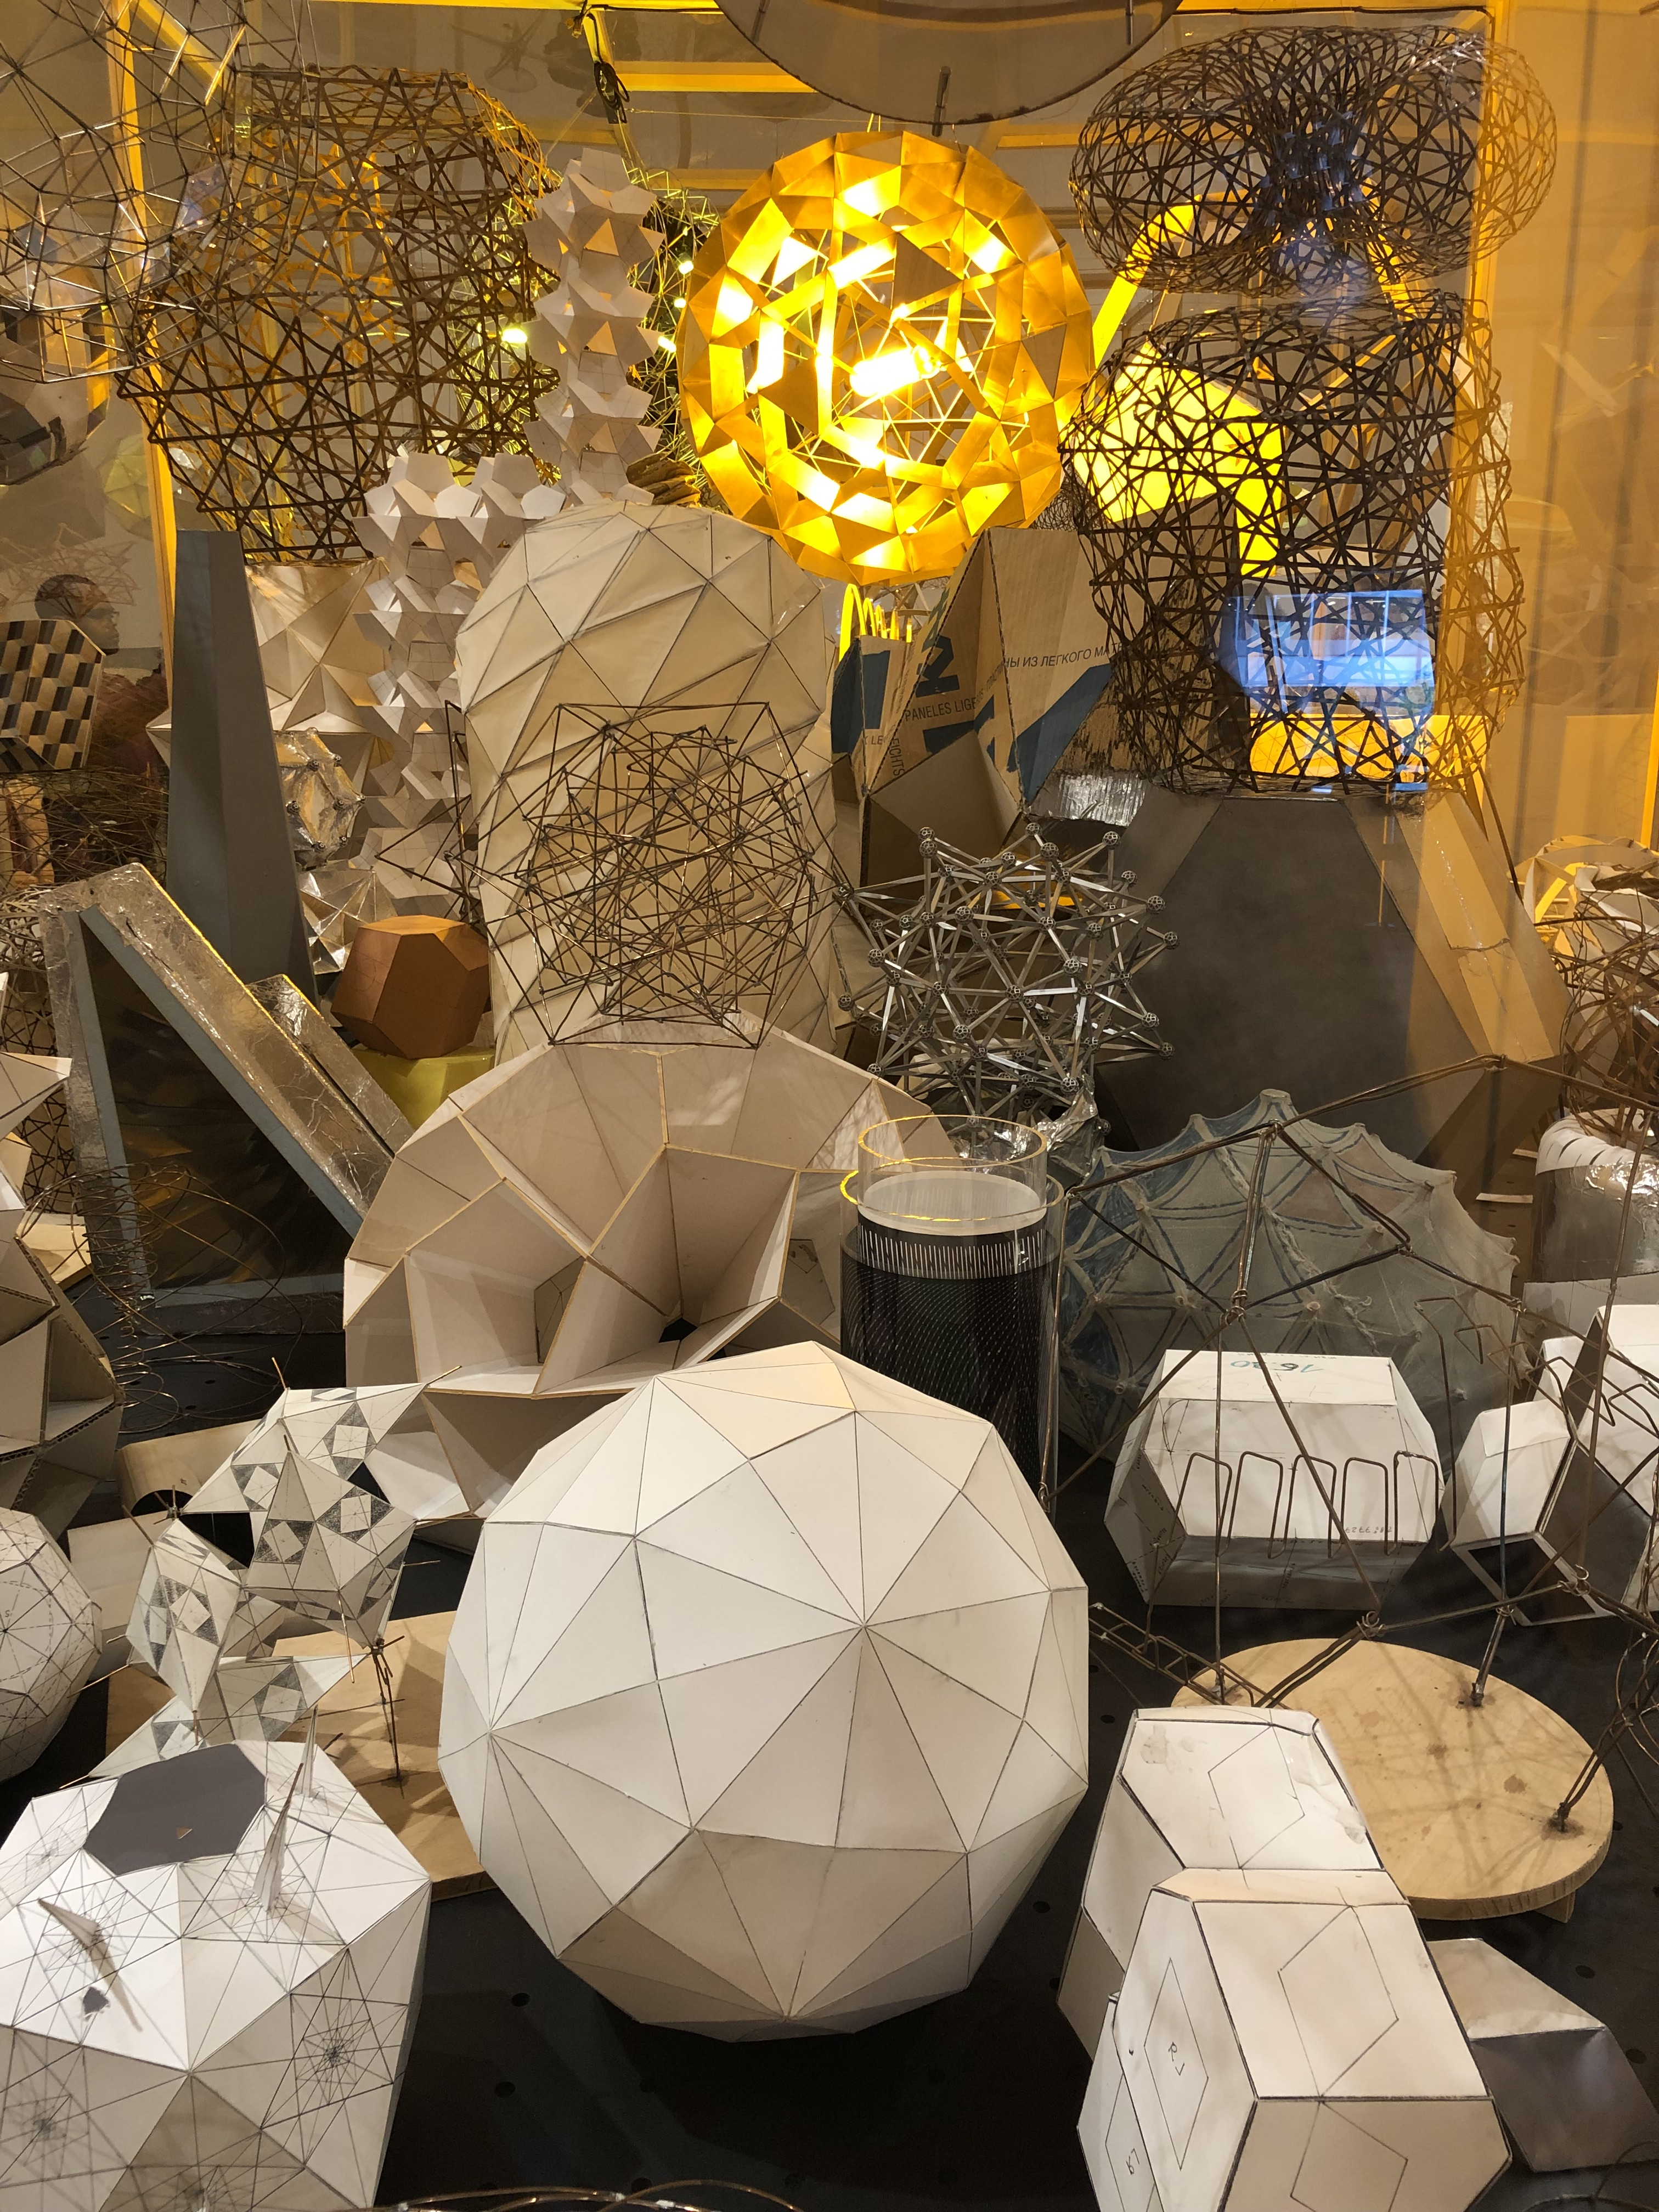 Model Room By Olafur Eliasson (2003)